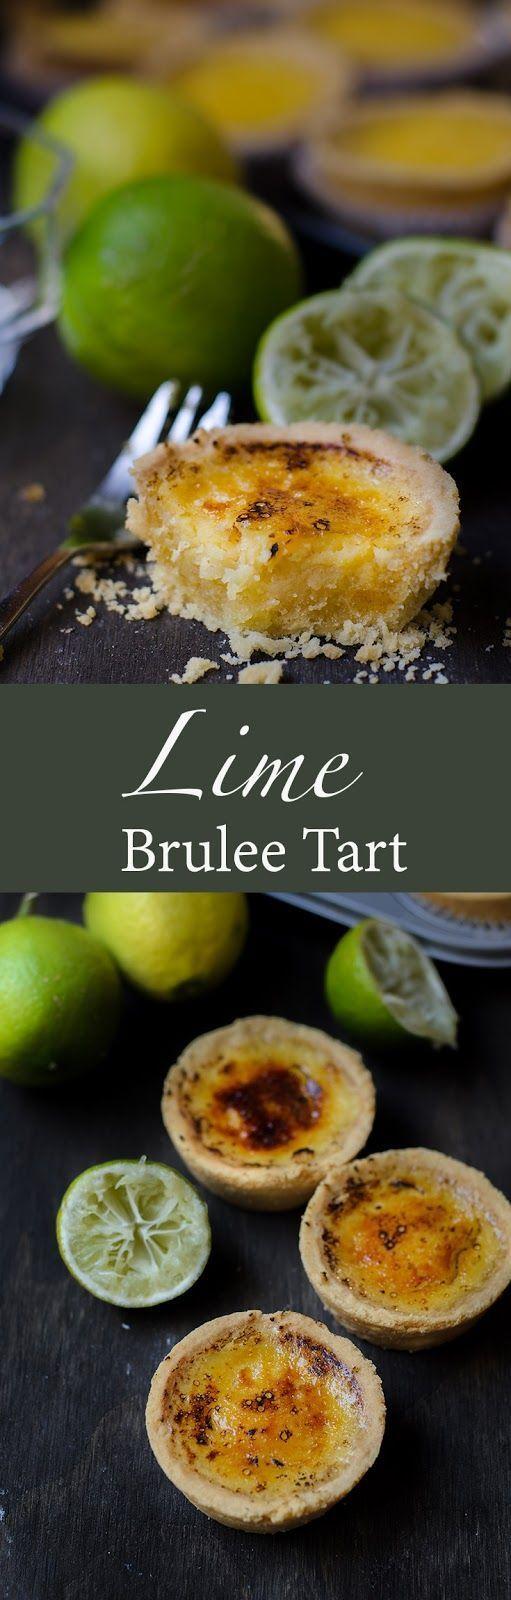 Lime Brûlée Tart